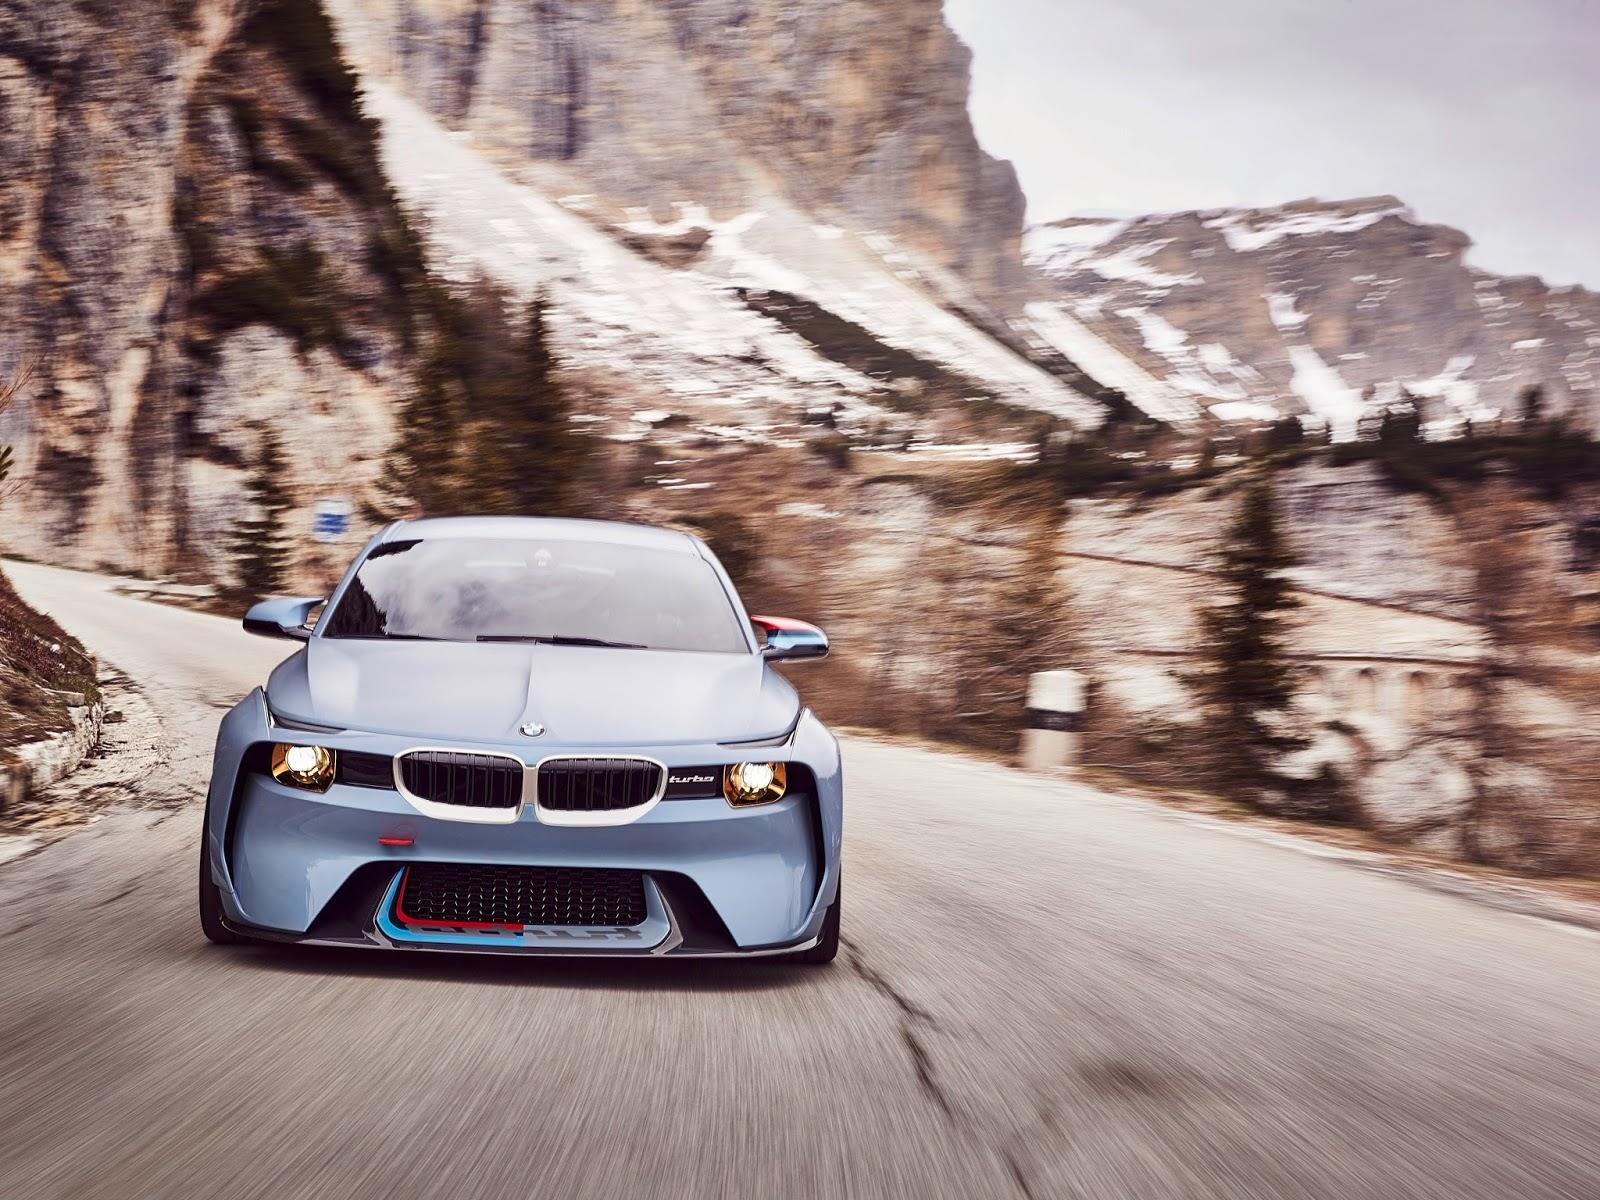 P90219727 highRes bmw 2002 hommage 05 1 1 H BMW γιορτάζει τα 50 χρόνια της θρυλικής 2002 turbo και παρουσιάζει την Bmw 2002 Hommage BMW, BMW 2002, BMW 2002 turbo, BMW Concept, BMW Hommage, supercars, videos